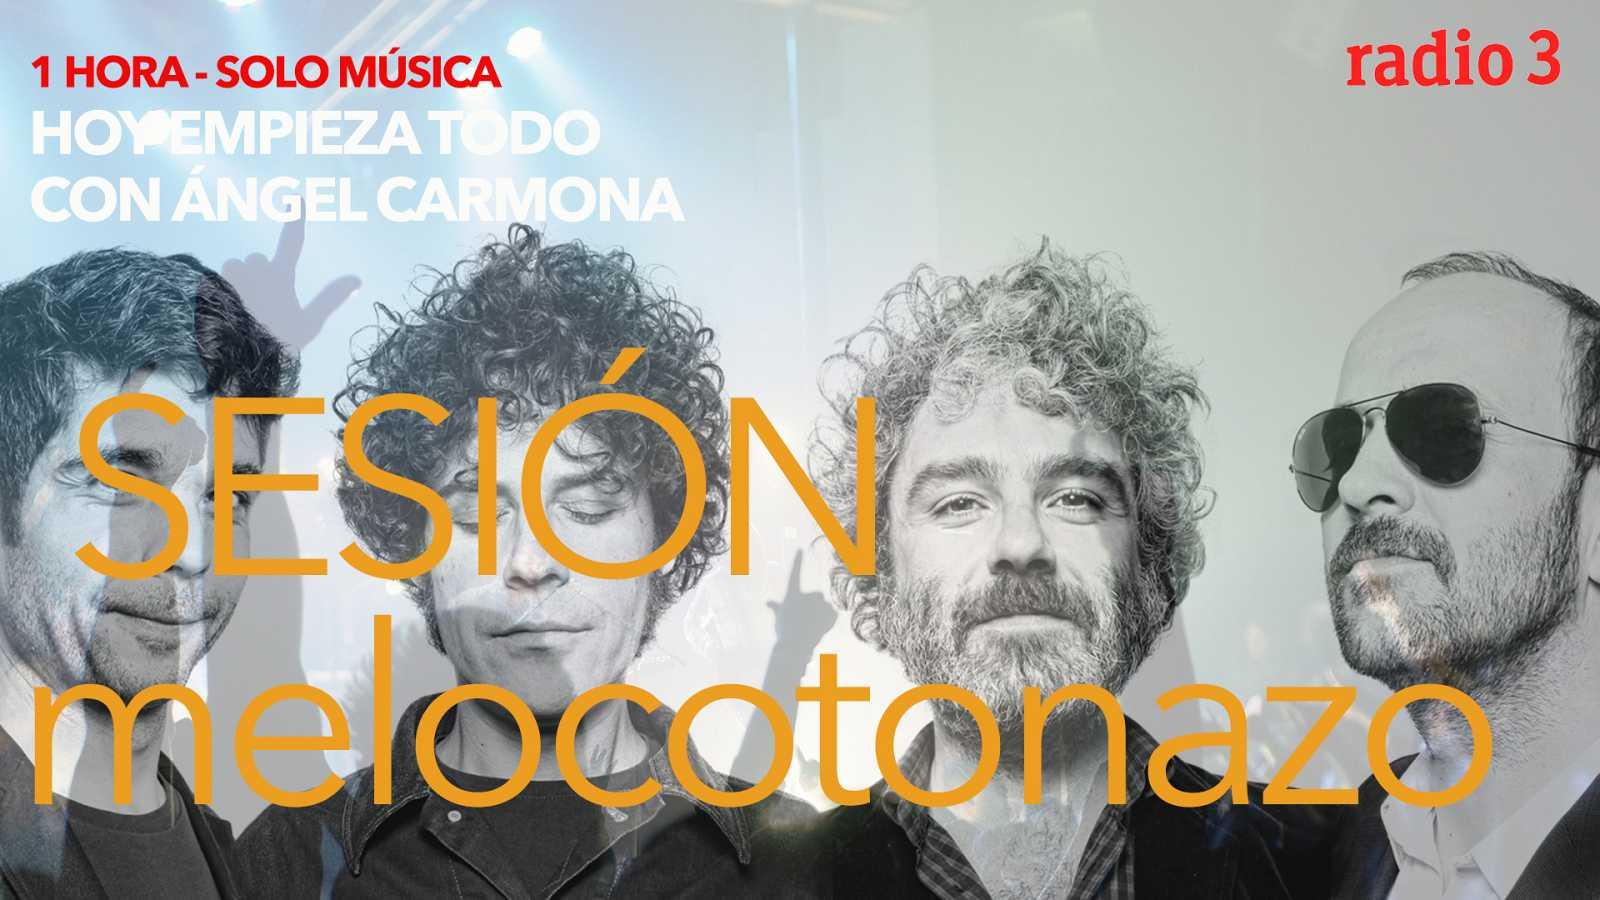 Hoy empieza todo con Ángel Carmona - #SesiónMelocotonazo: Red Hot Chili Peppers, León Benavente, Kiko Veneno... - 05/03/21 - escuchar ahora